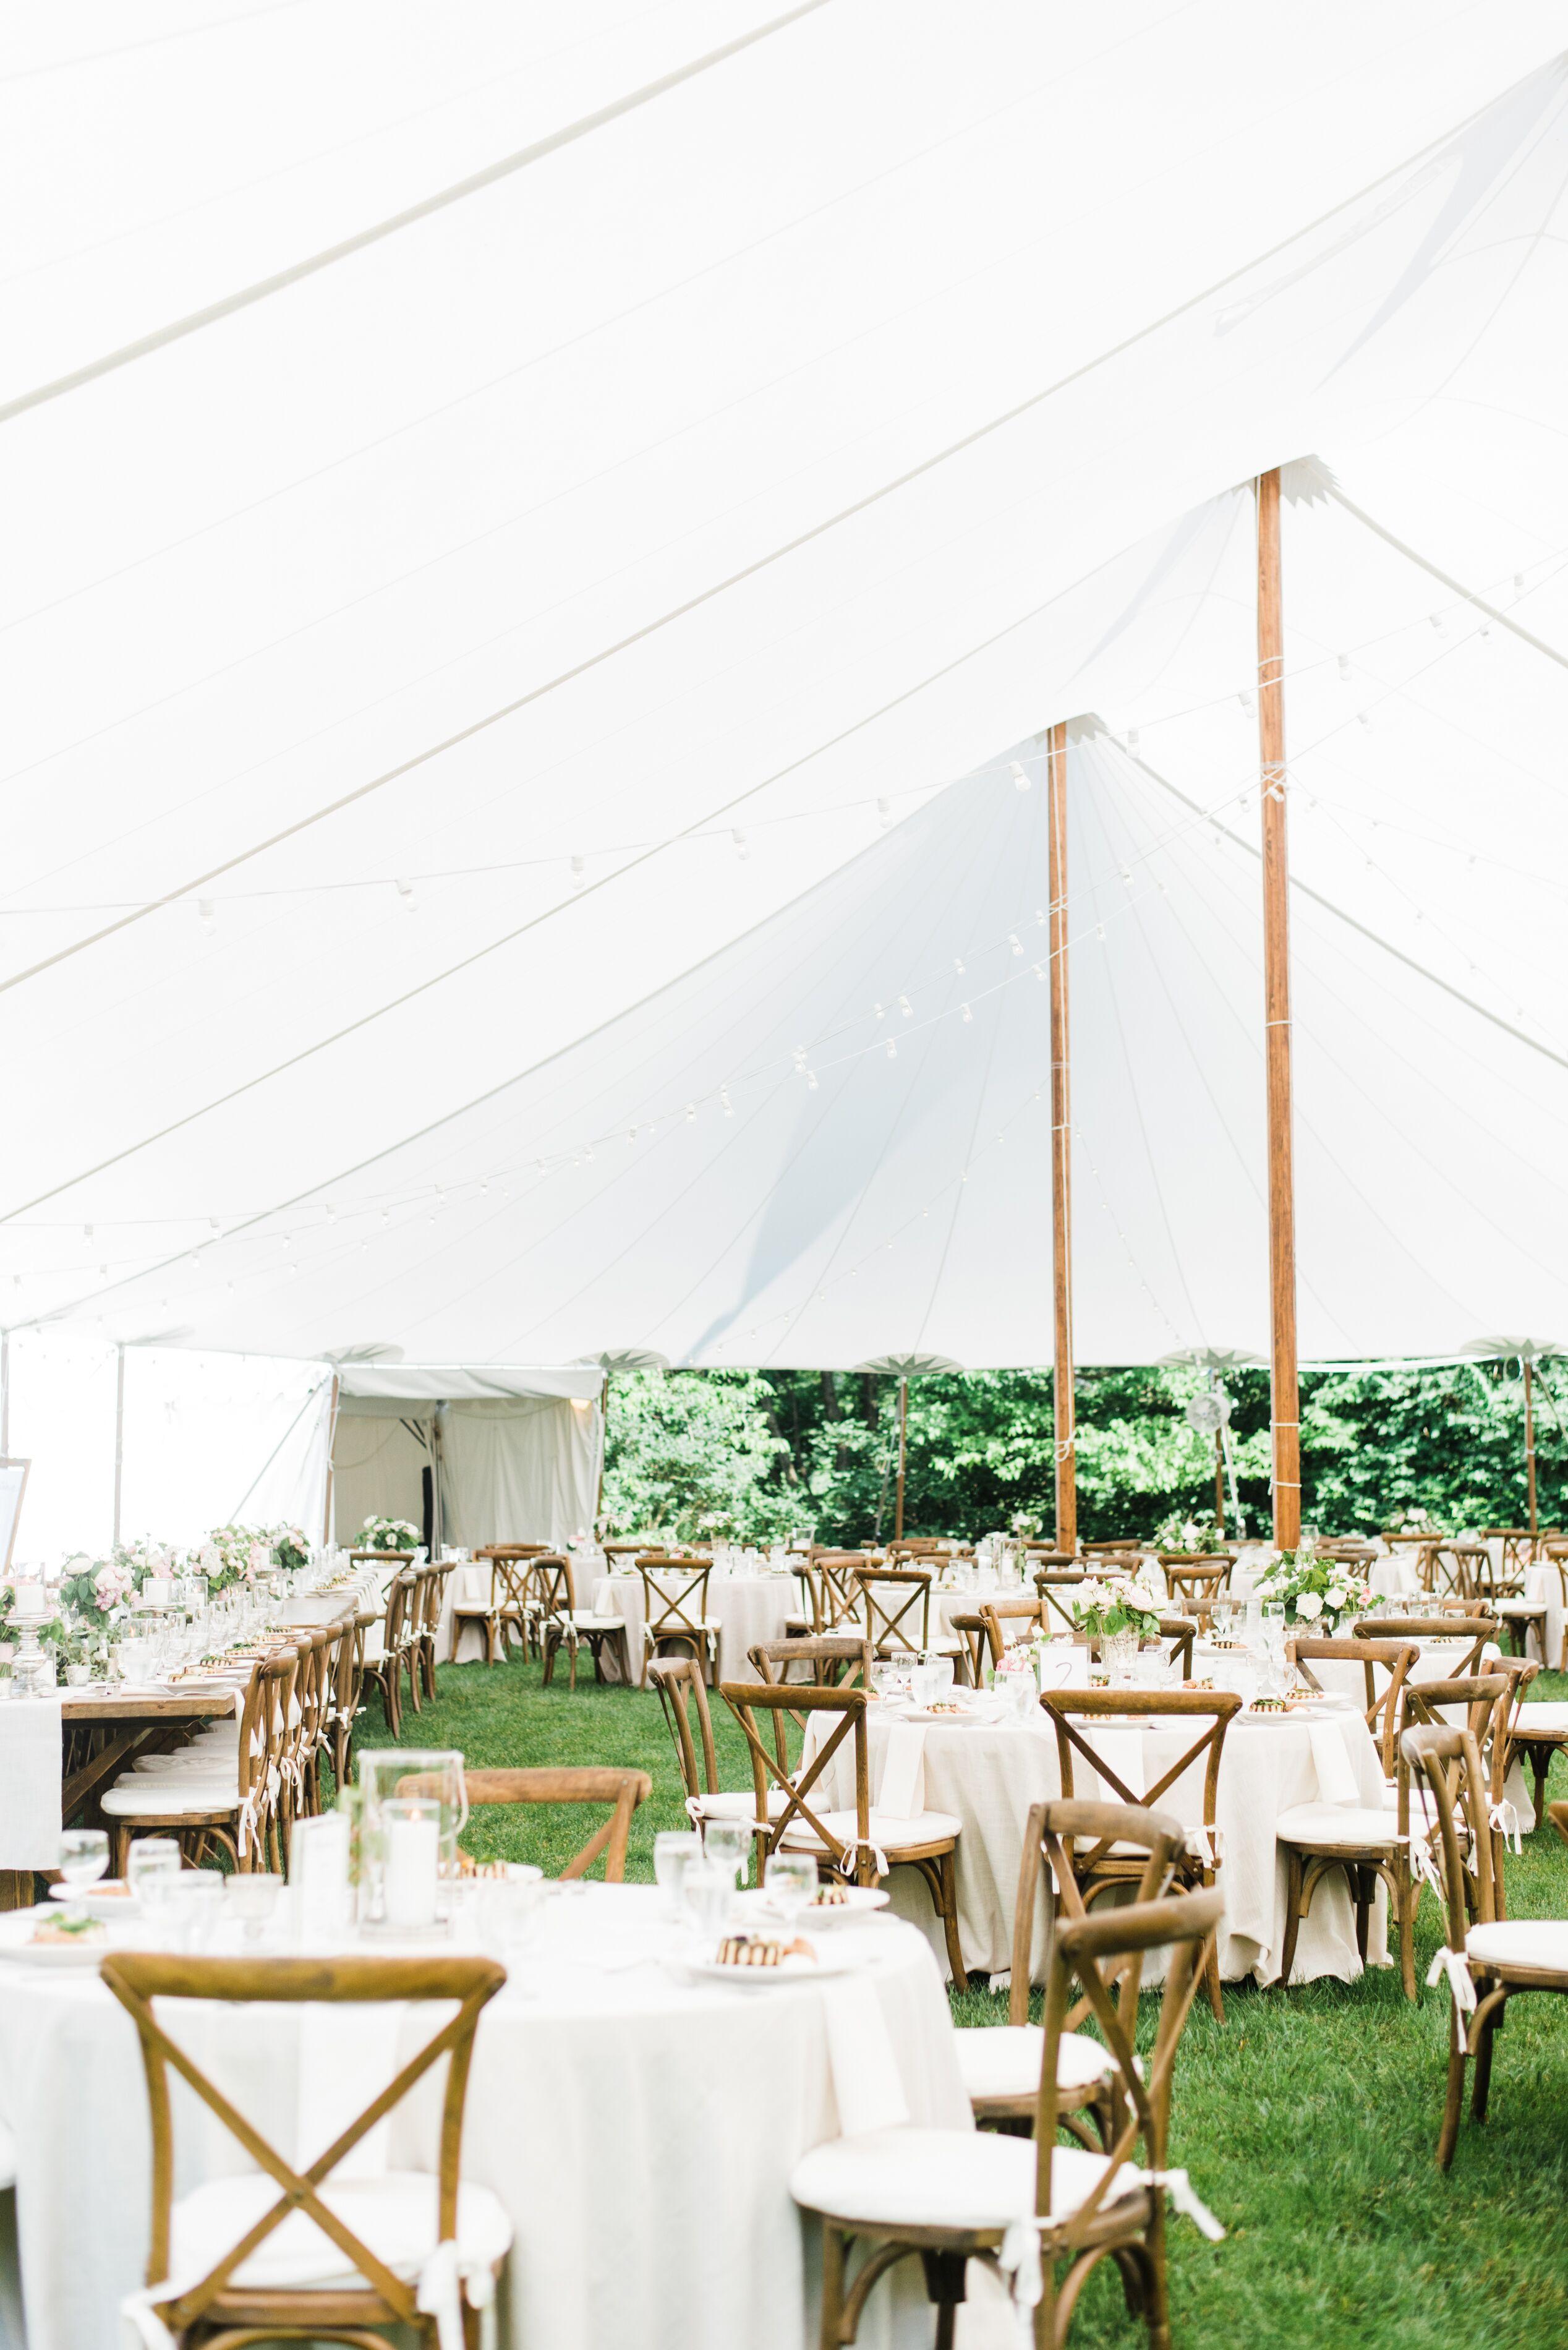 Inside-tent